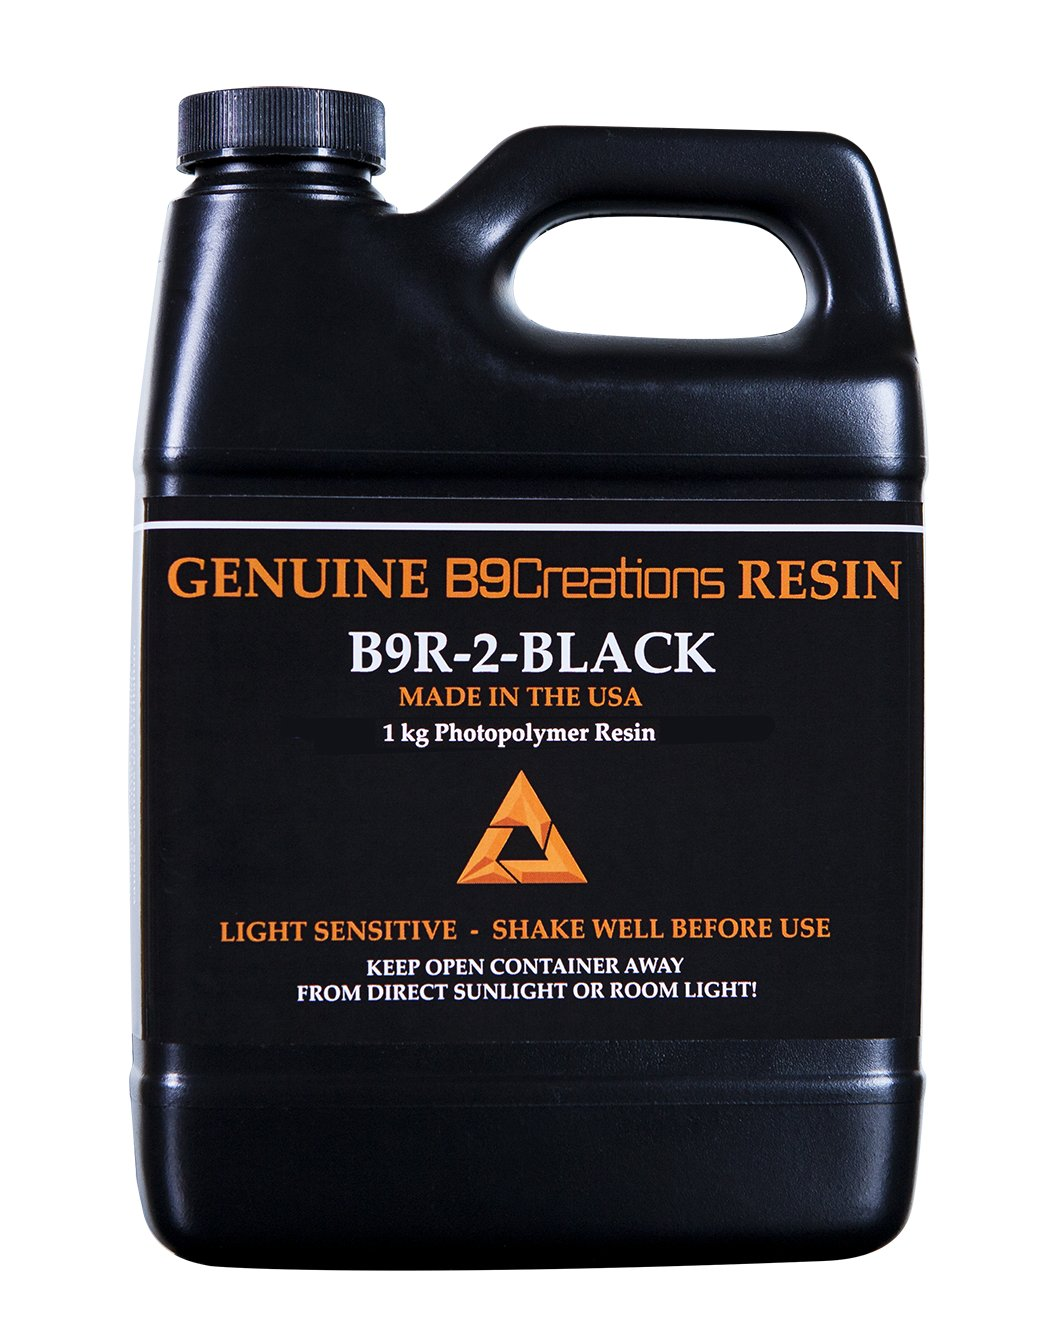 B9Creator Black(ブラックレジン)1Kg 試作品作成向け画像